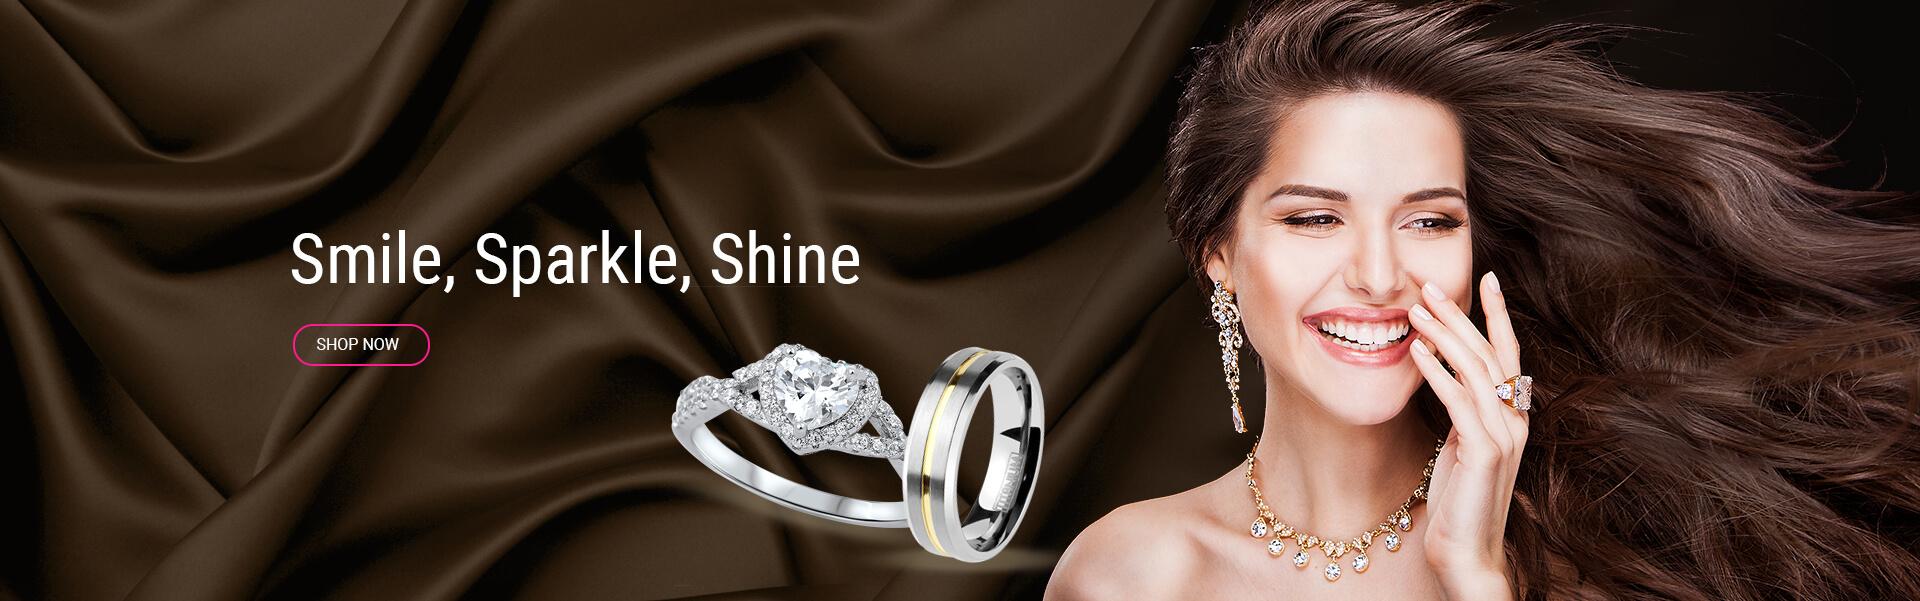 Buy Promise Rings Online